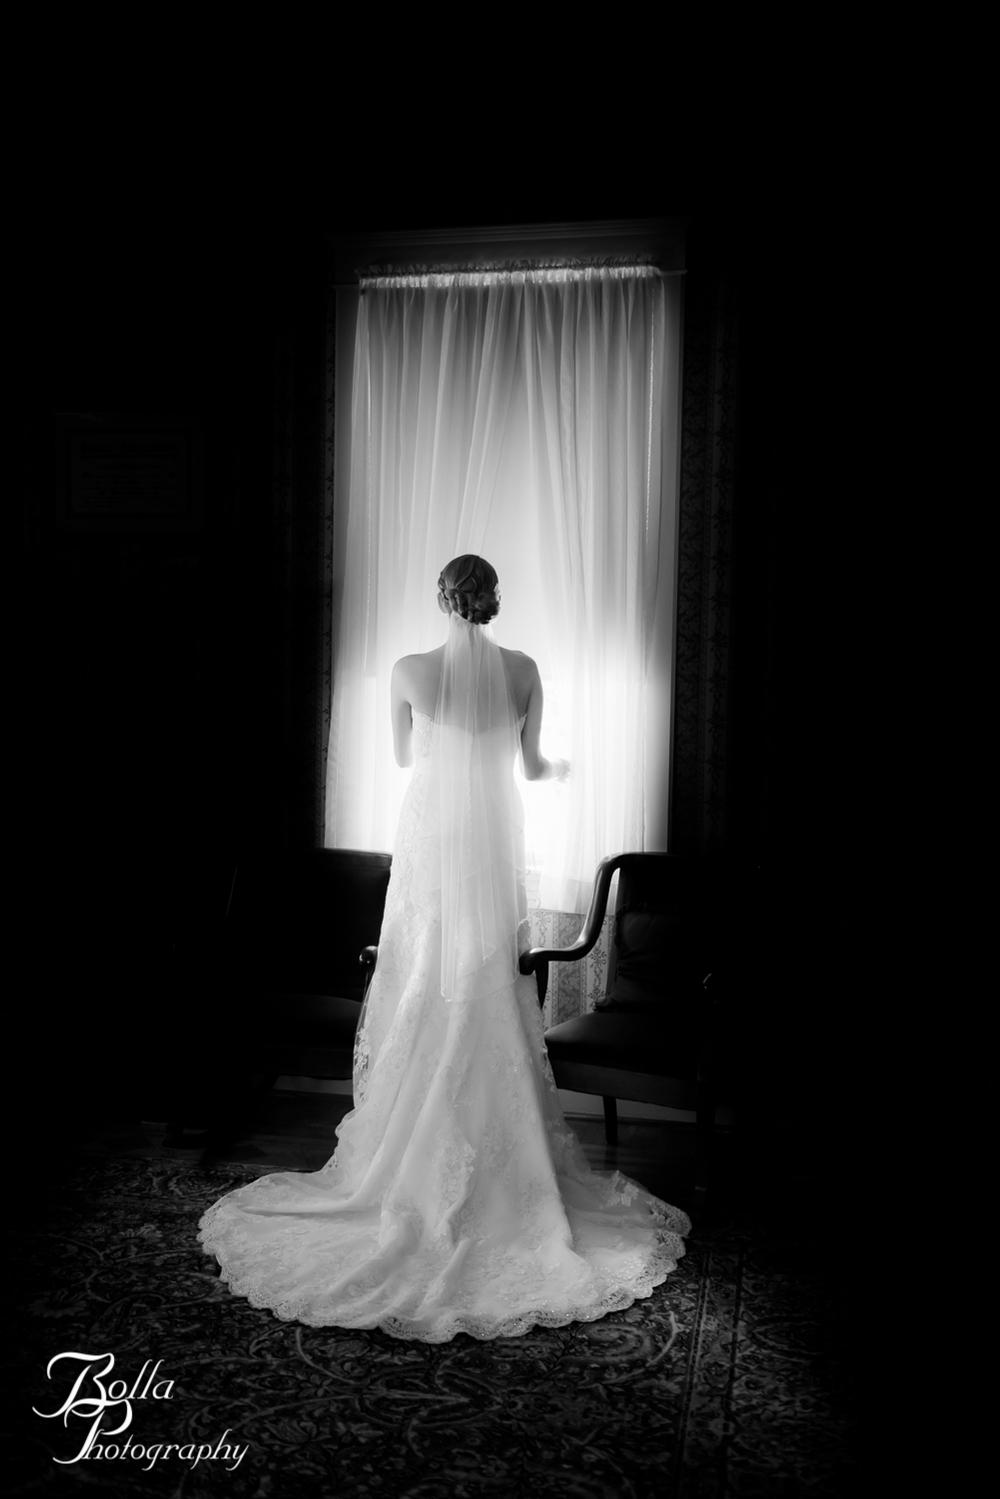 Bolla_Photography_St_Louis_wedding_photographer-0029.jpg